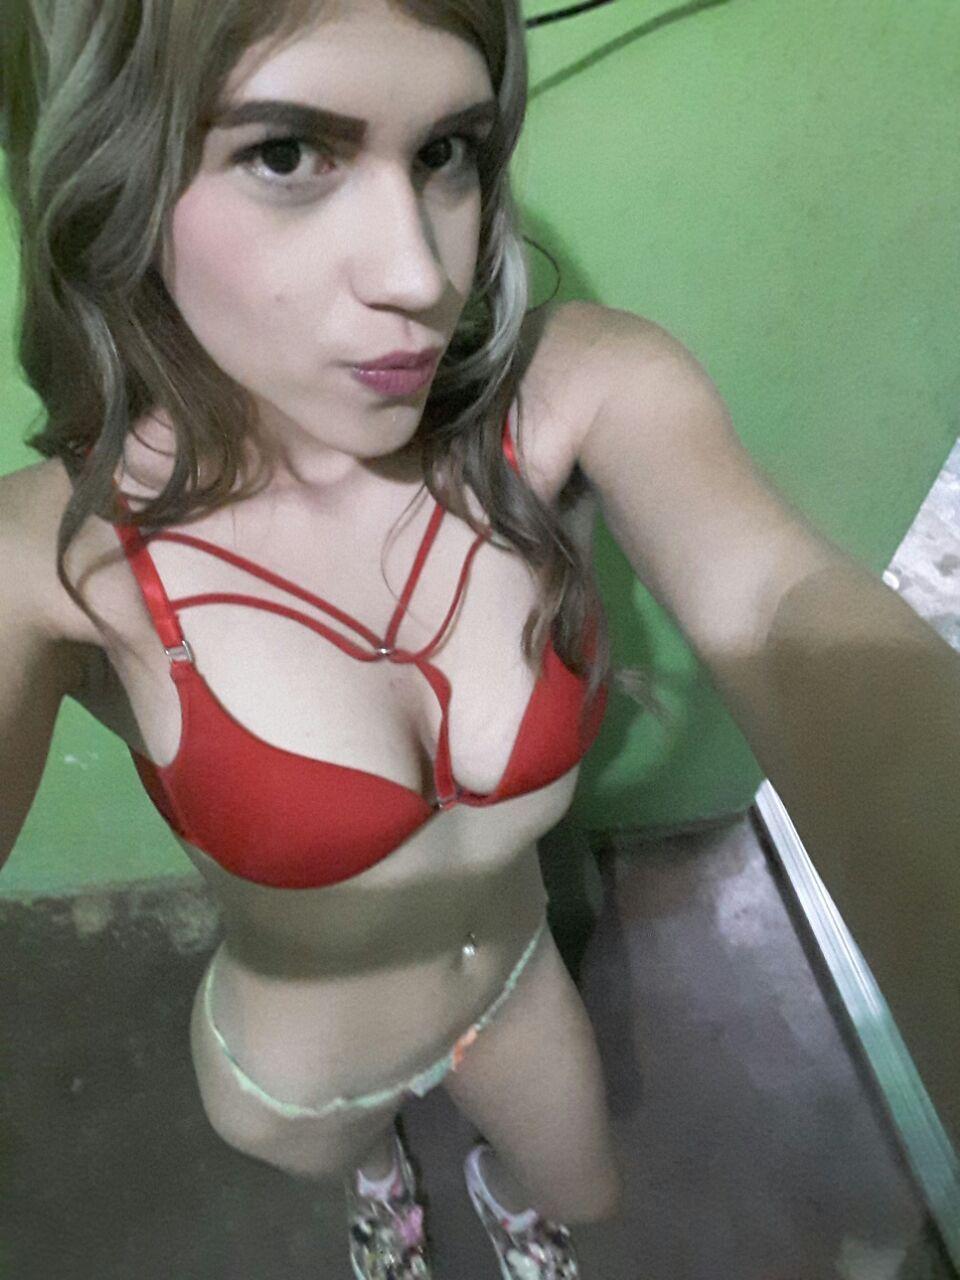 Suculenta Kelly Johana con pack de nudes explícitos completos + Videos.! 2